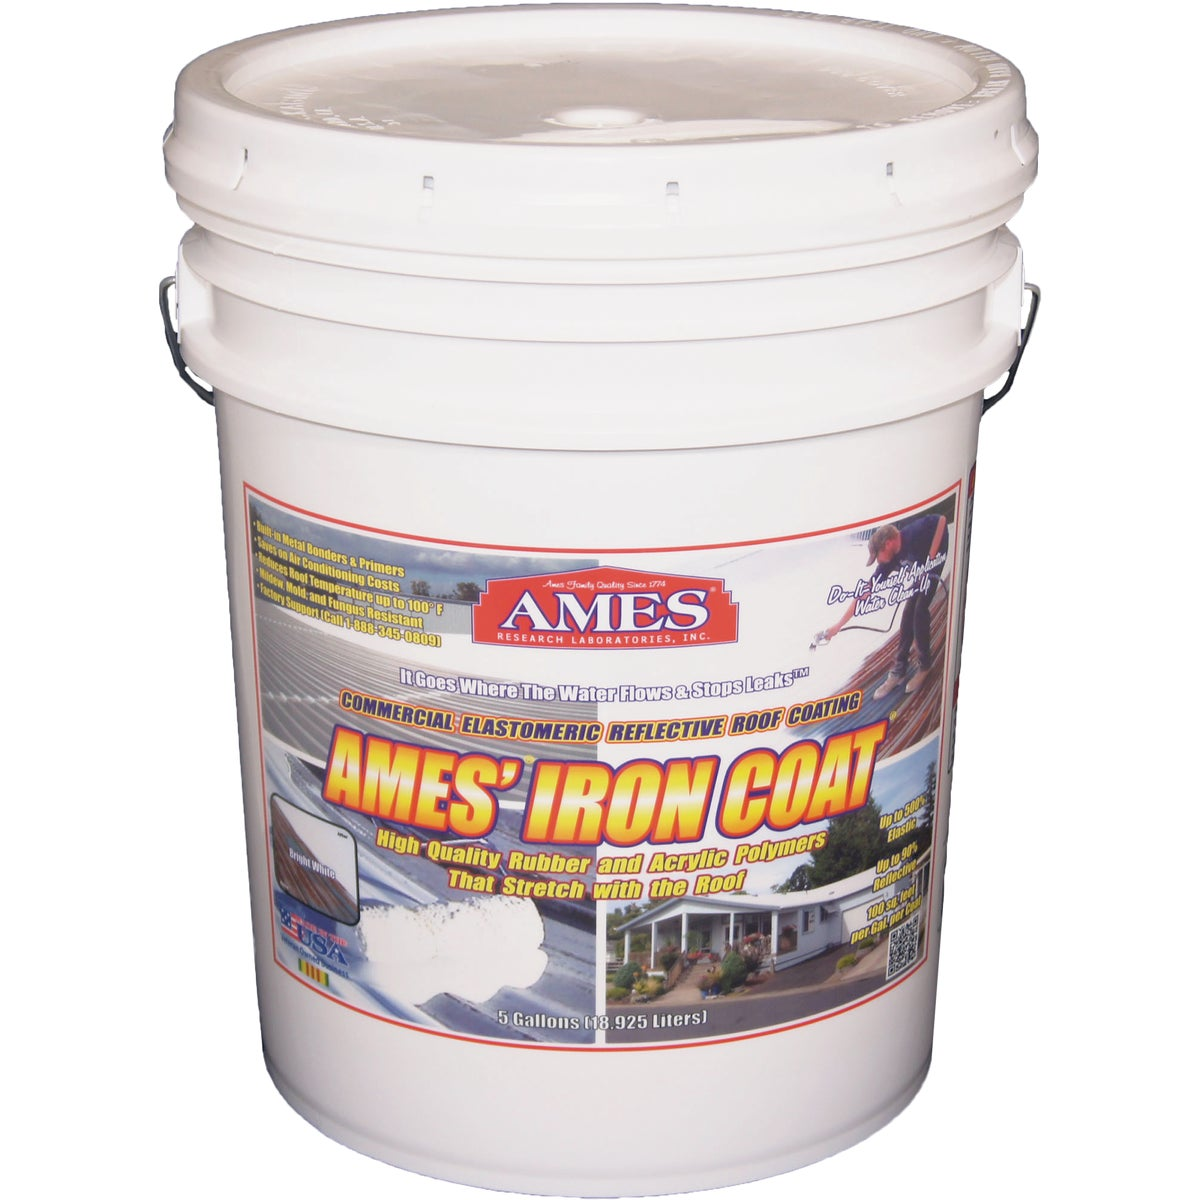 Ames Iron Coat Elastomeric Roof Coating